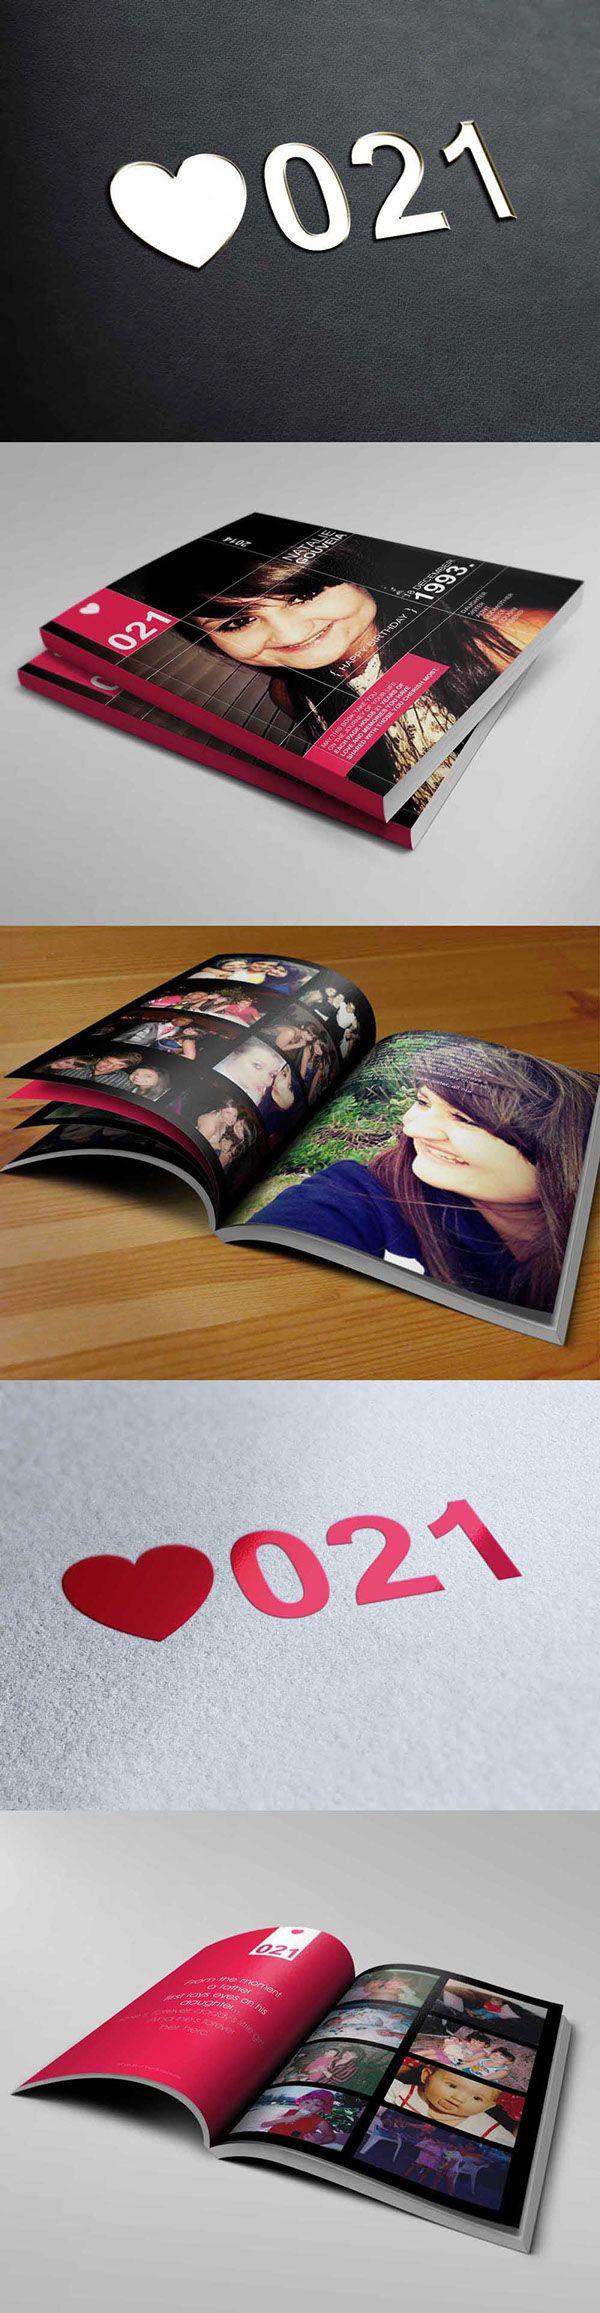 Natalie Gouveia | Birthday Book on Behance